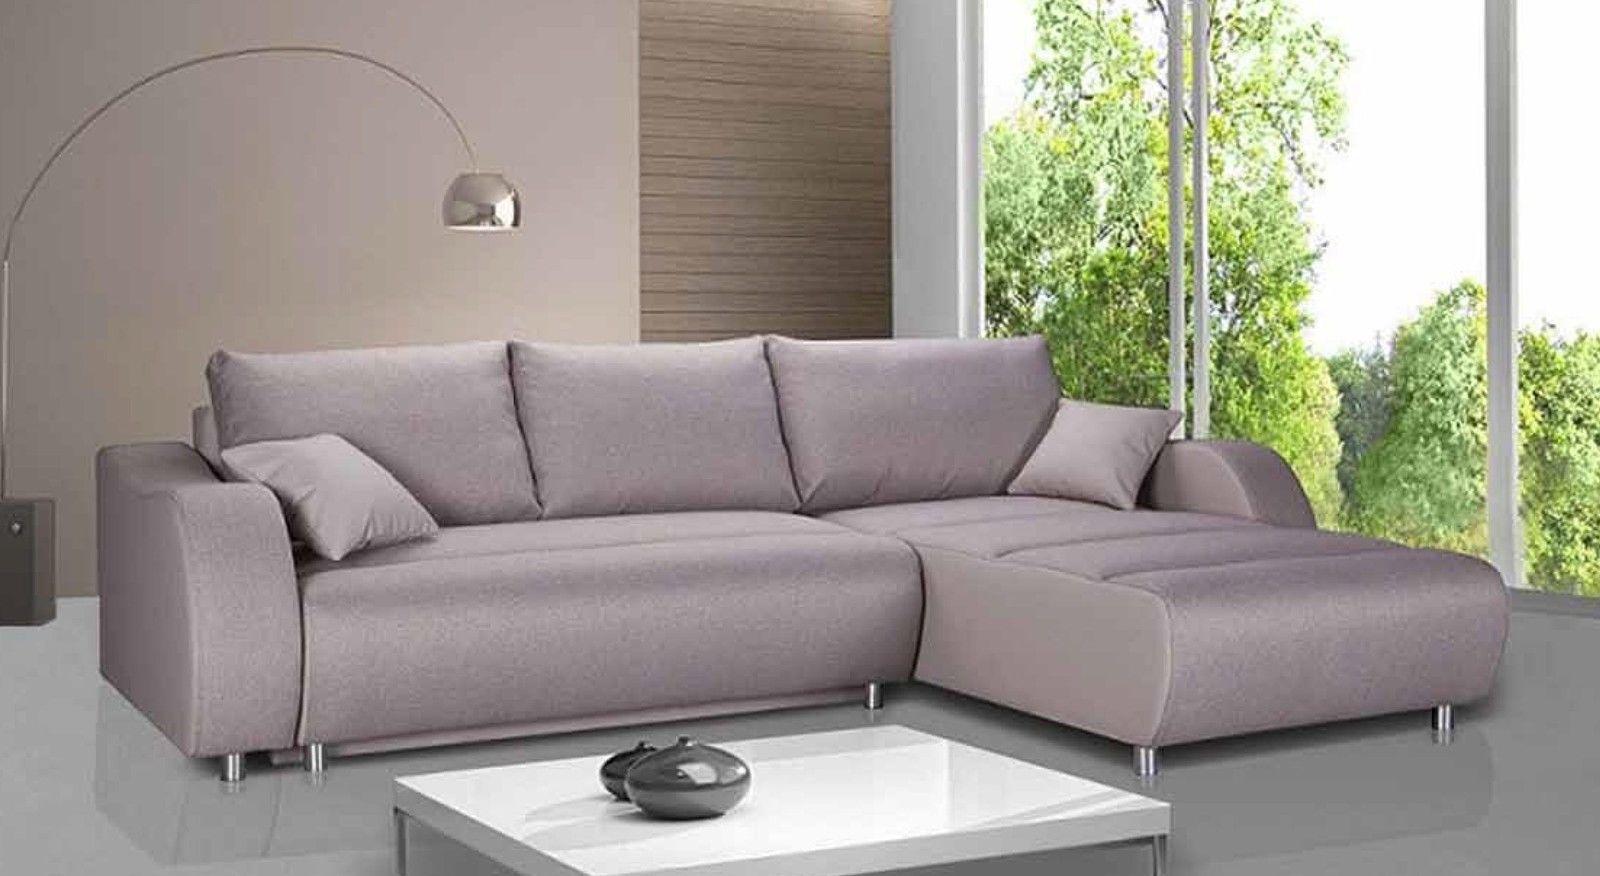 cheap corner sofa beds dublin loft sofas uk large bed baci living room